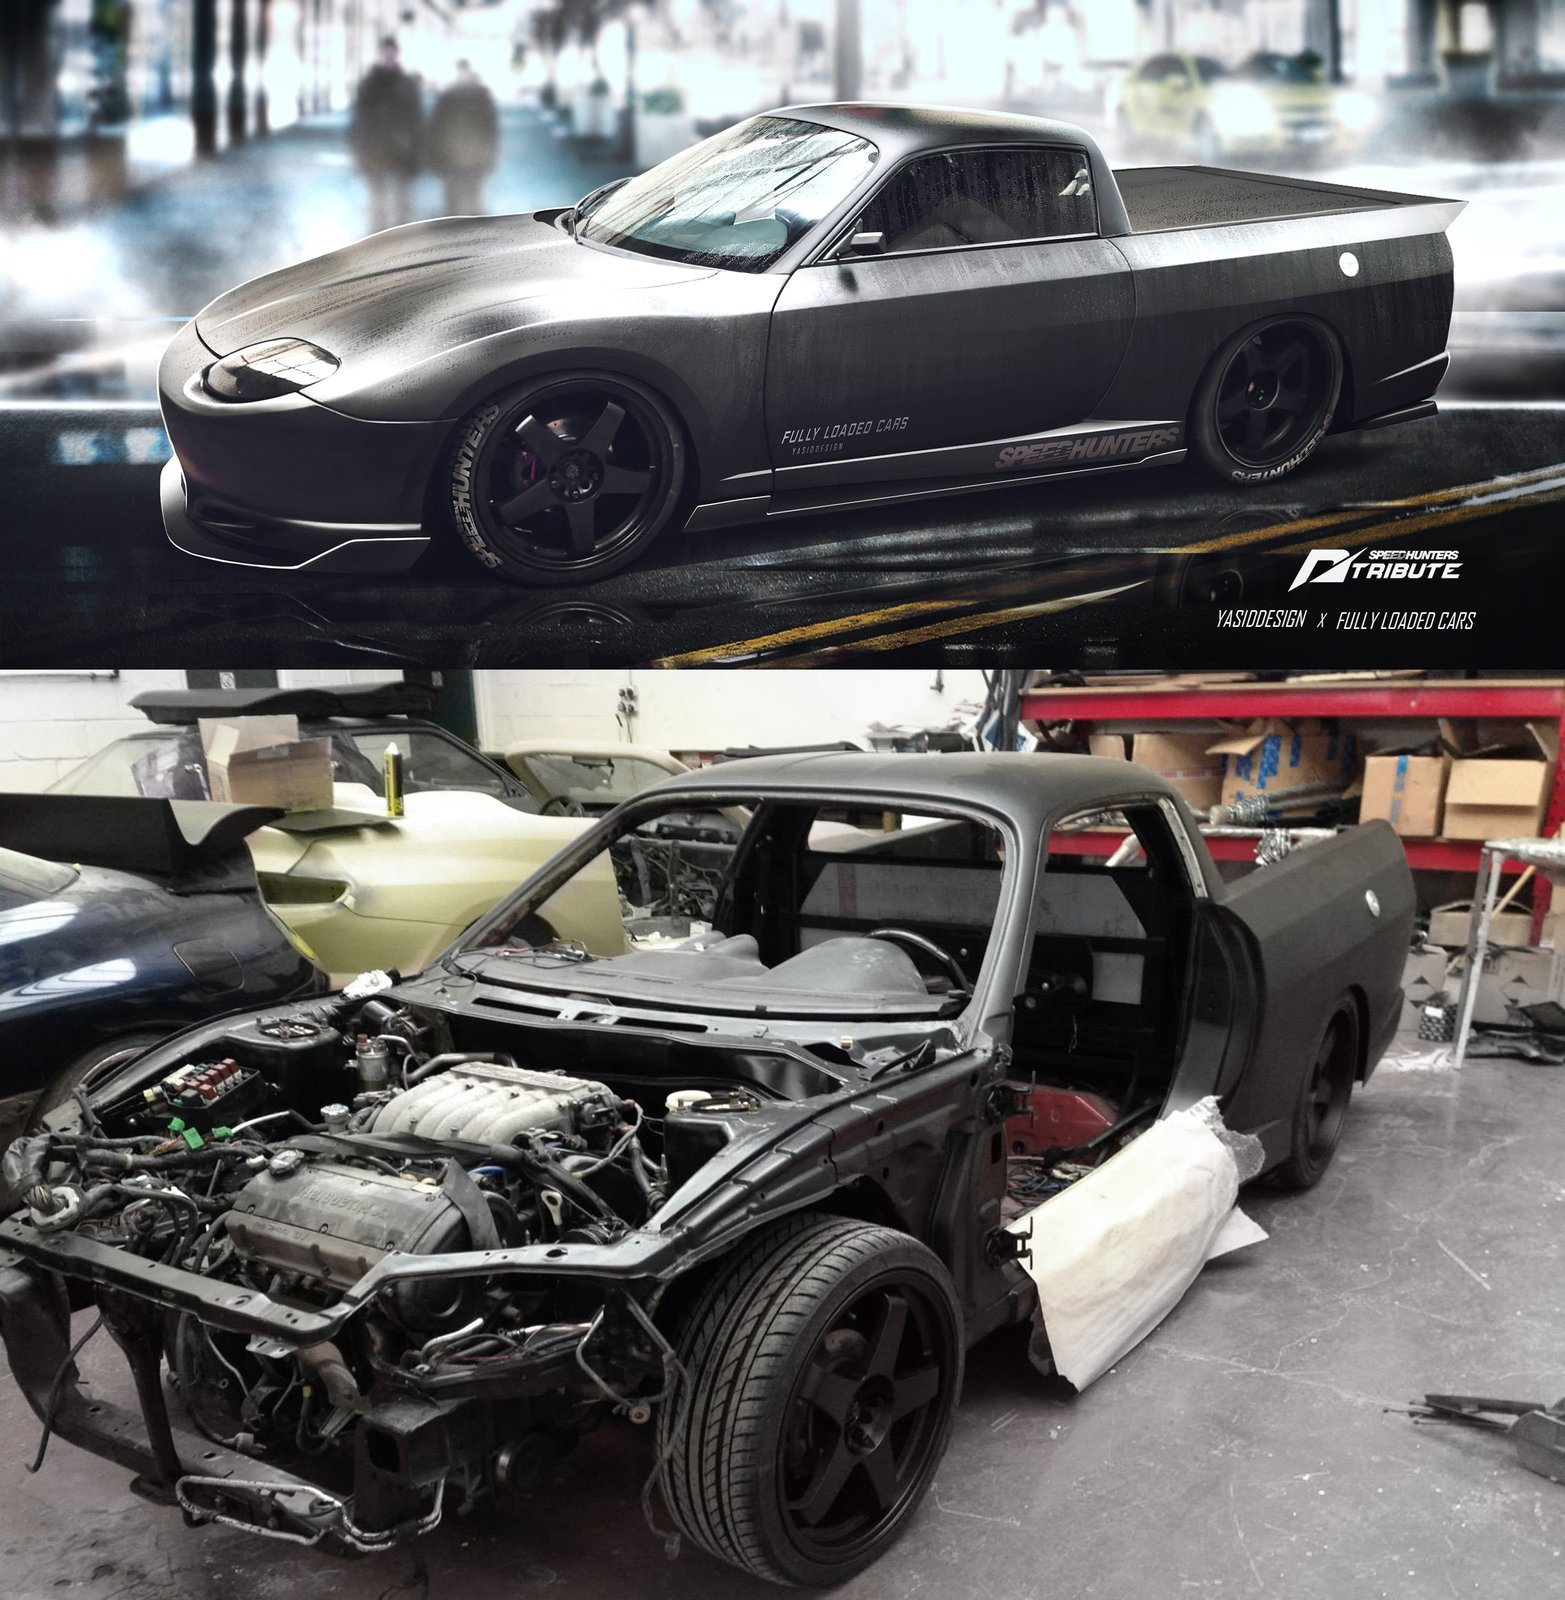 yasiddesign X fullyloadedcars FTO build